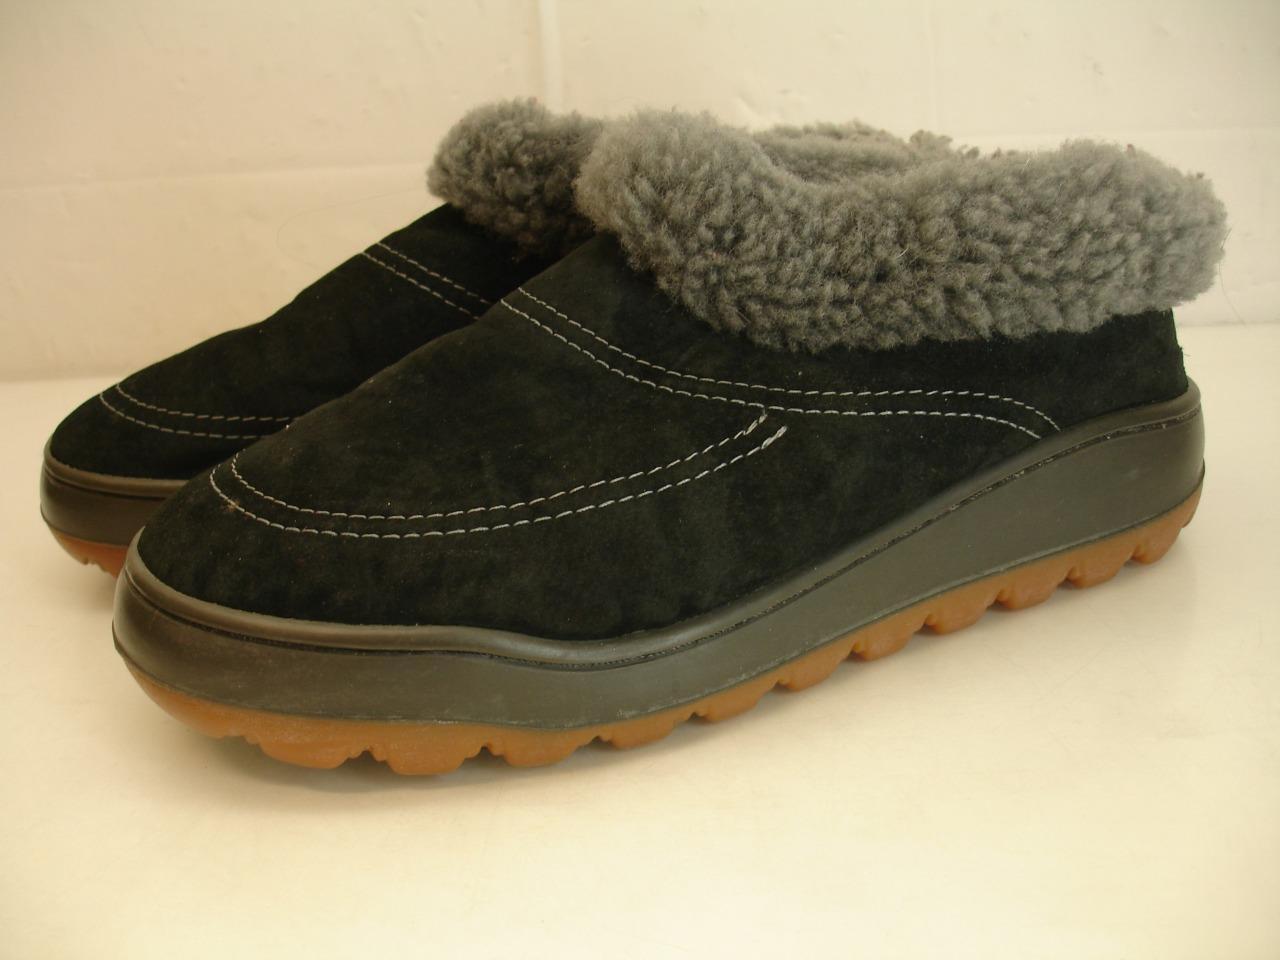 Mens sz 8 M 40 41 Ecologic Black Skeepskin Shearling Fur Slippers Slip-On shoes